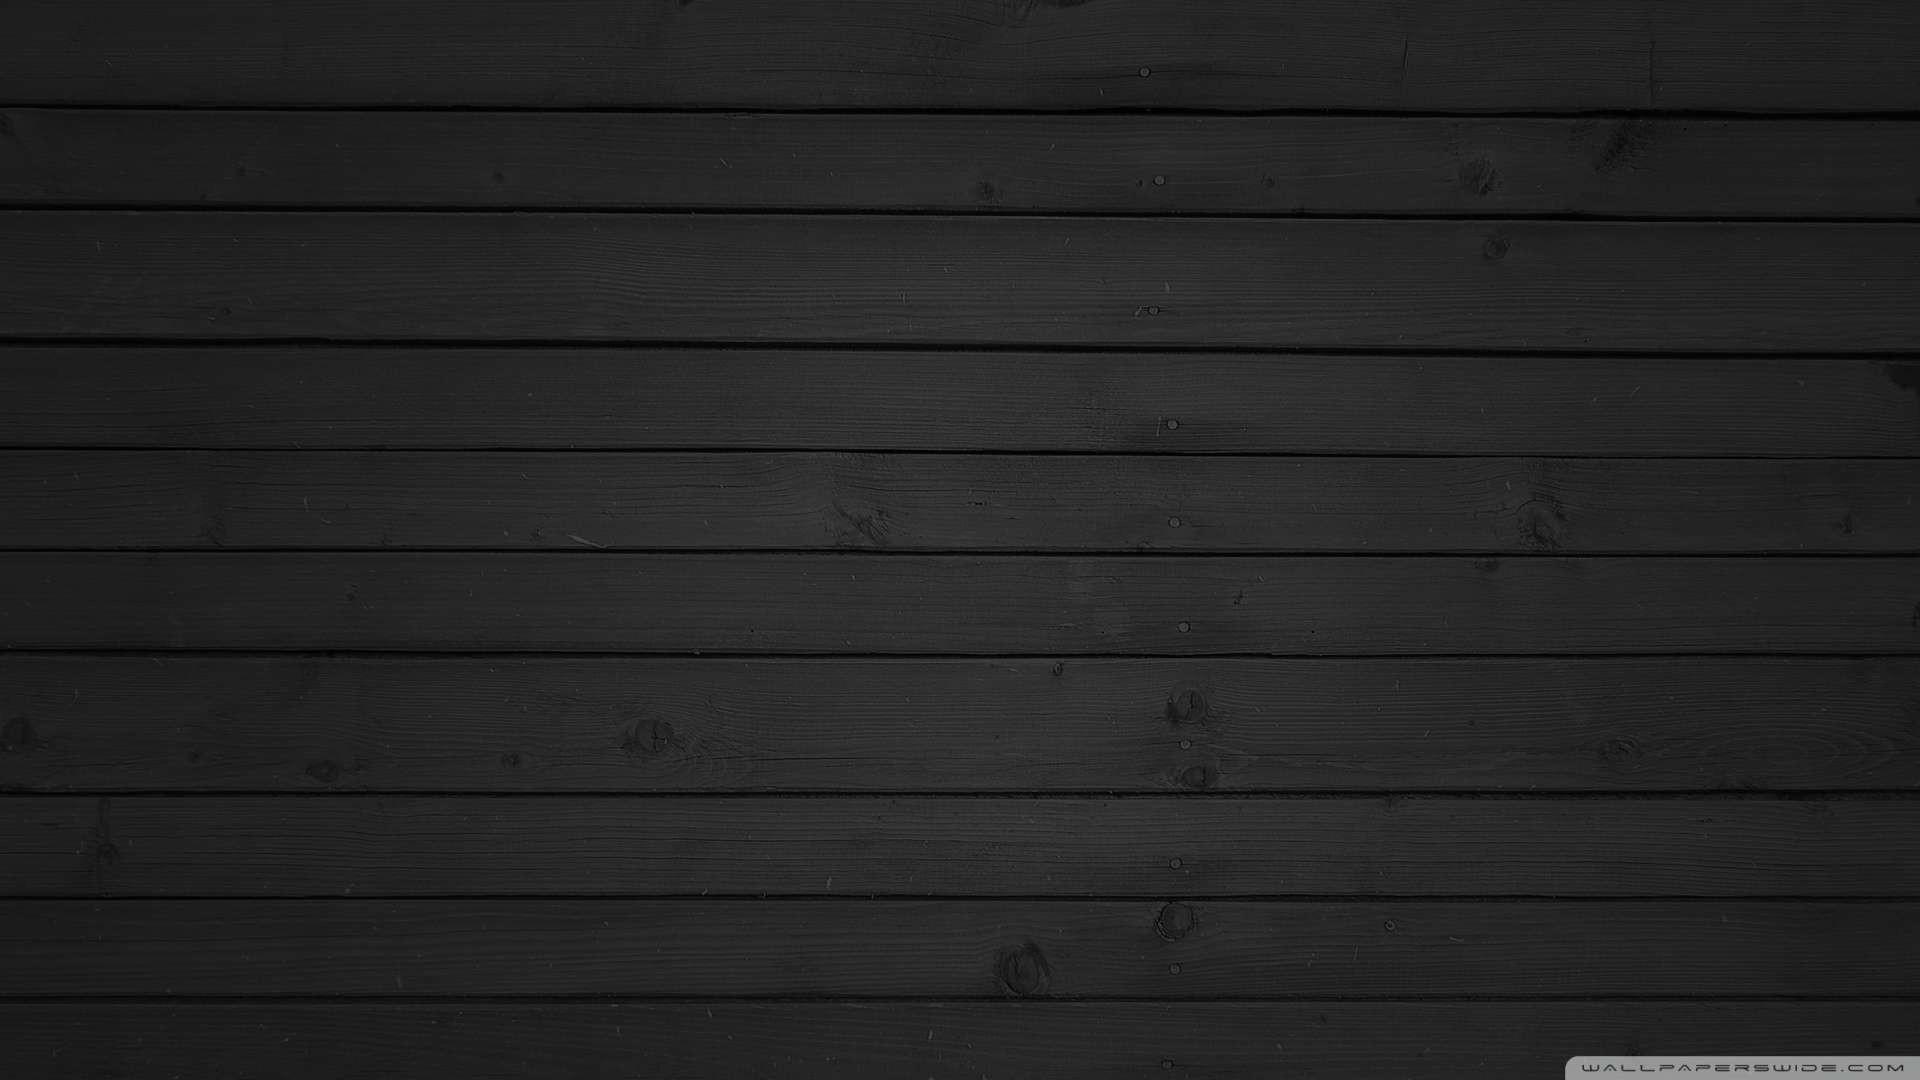 Dark Wallpaper p 1920×1080 1080p Dark Wallpapers (42 Wallpapers) | Adorable  Wallpapers